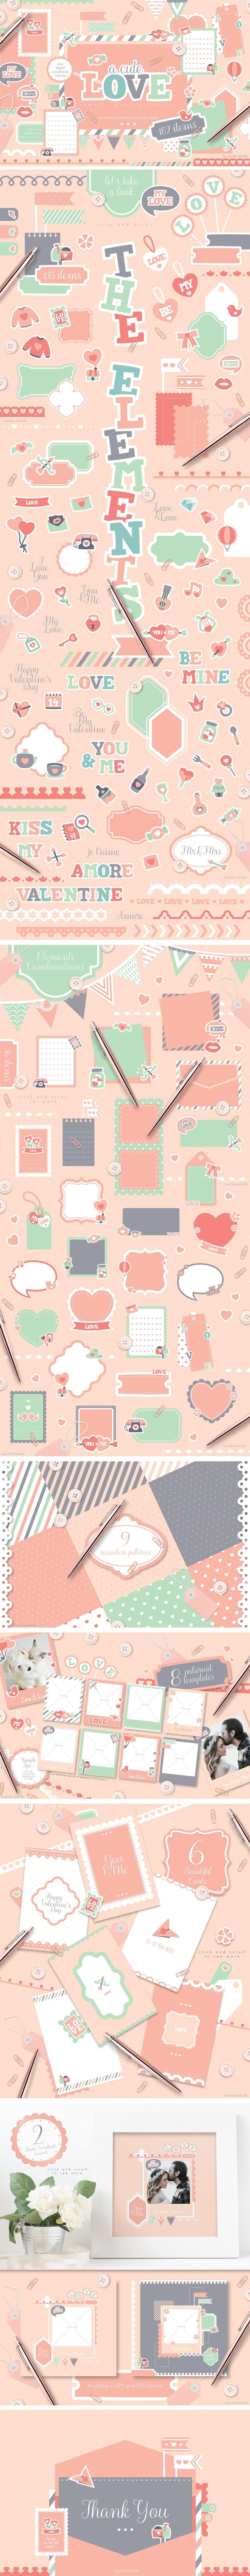 A Cute Love Romantic Decoration Kit - preview 04